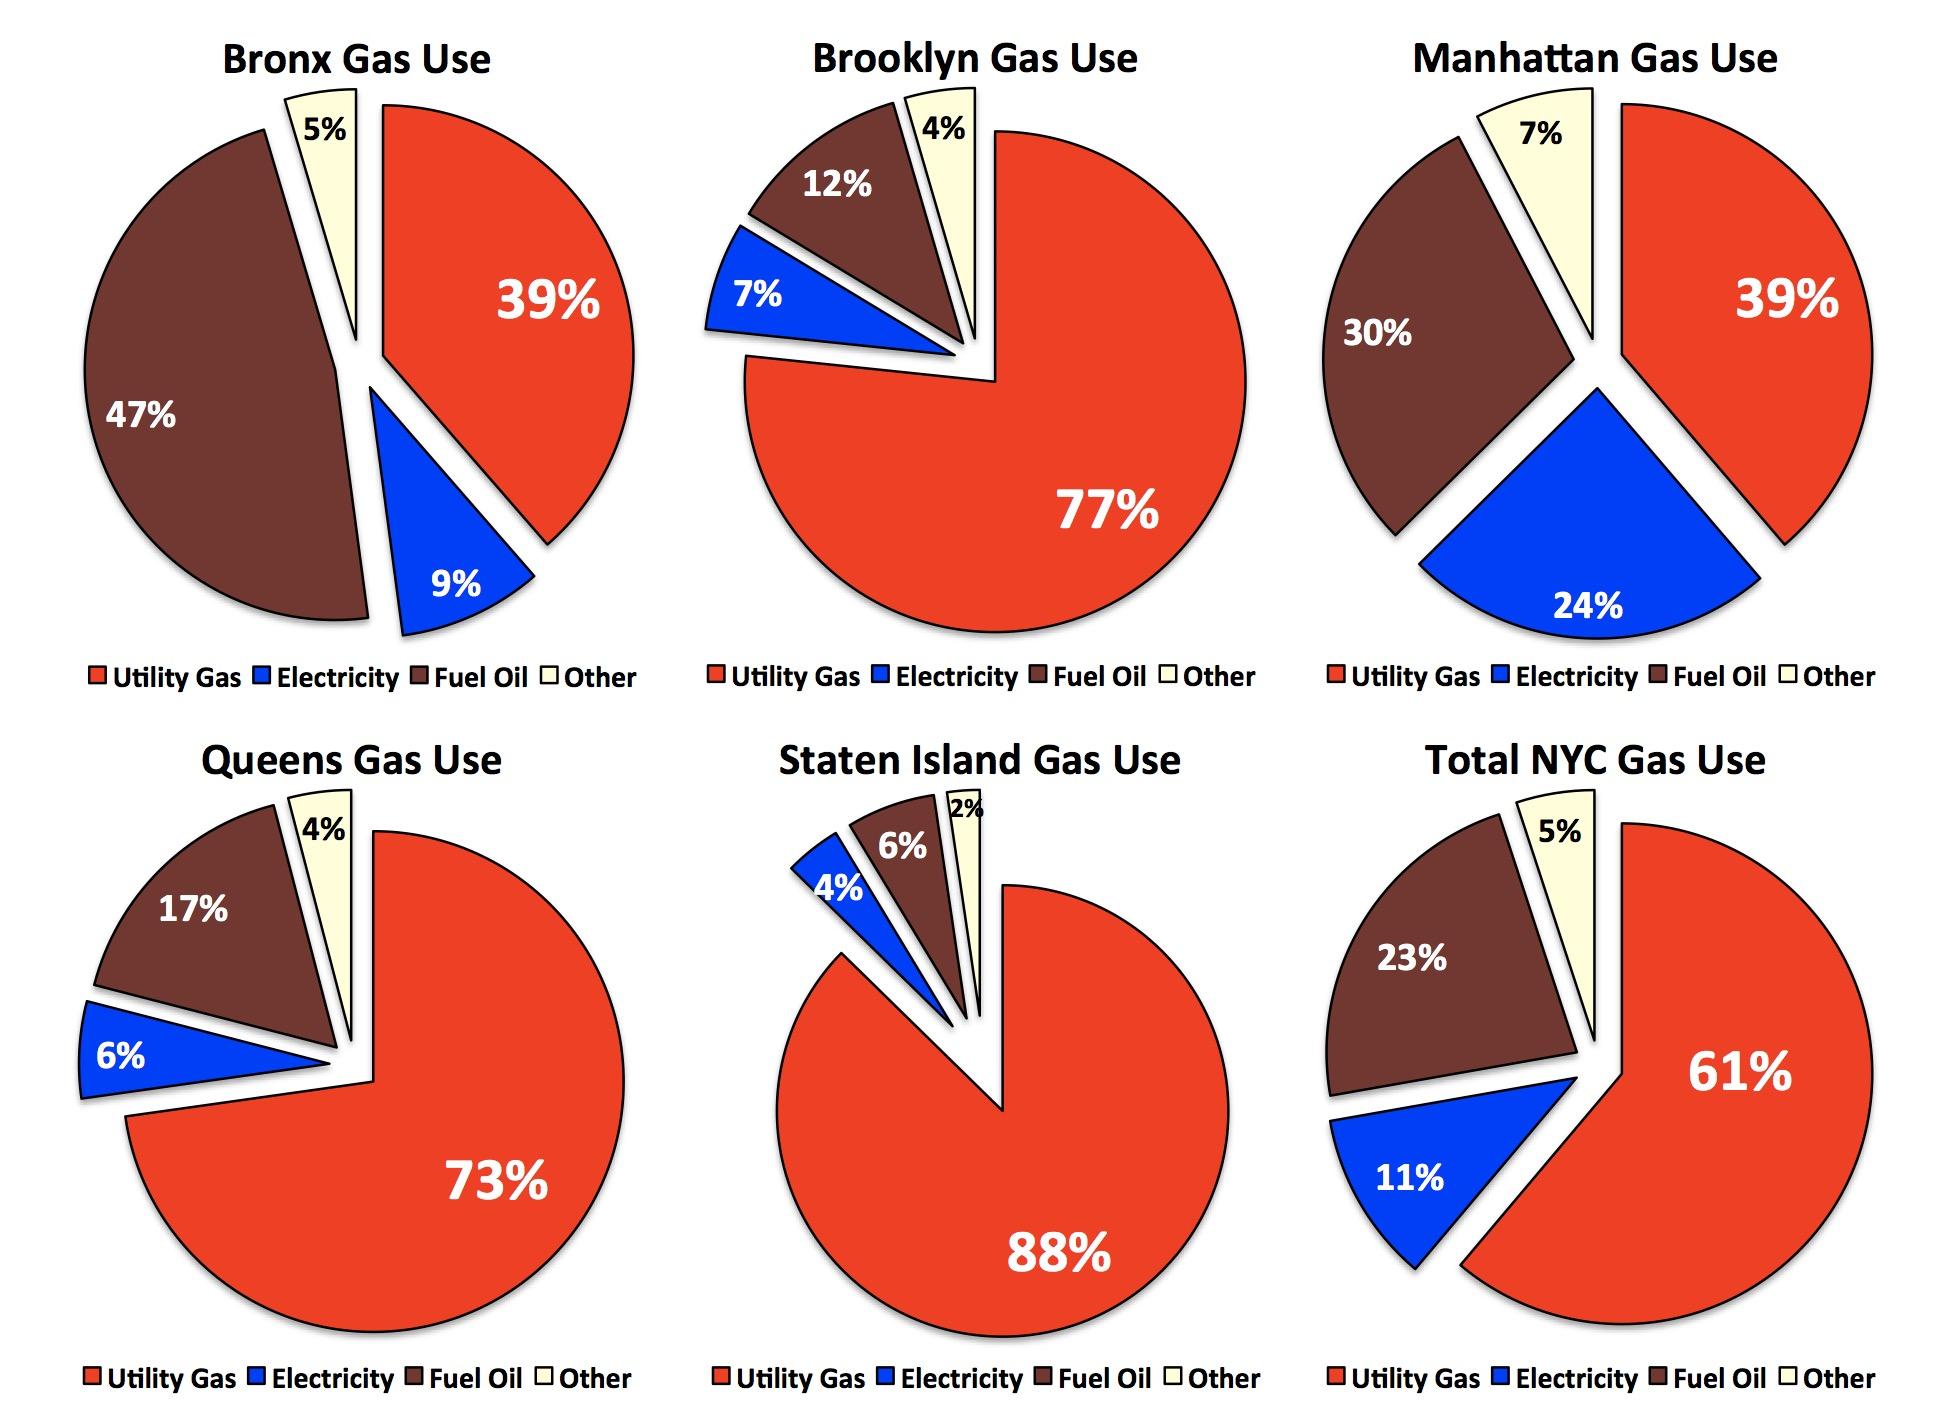 New York City Natural Gas Use